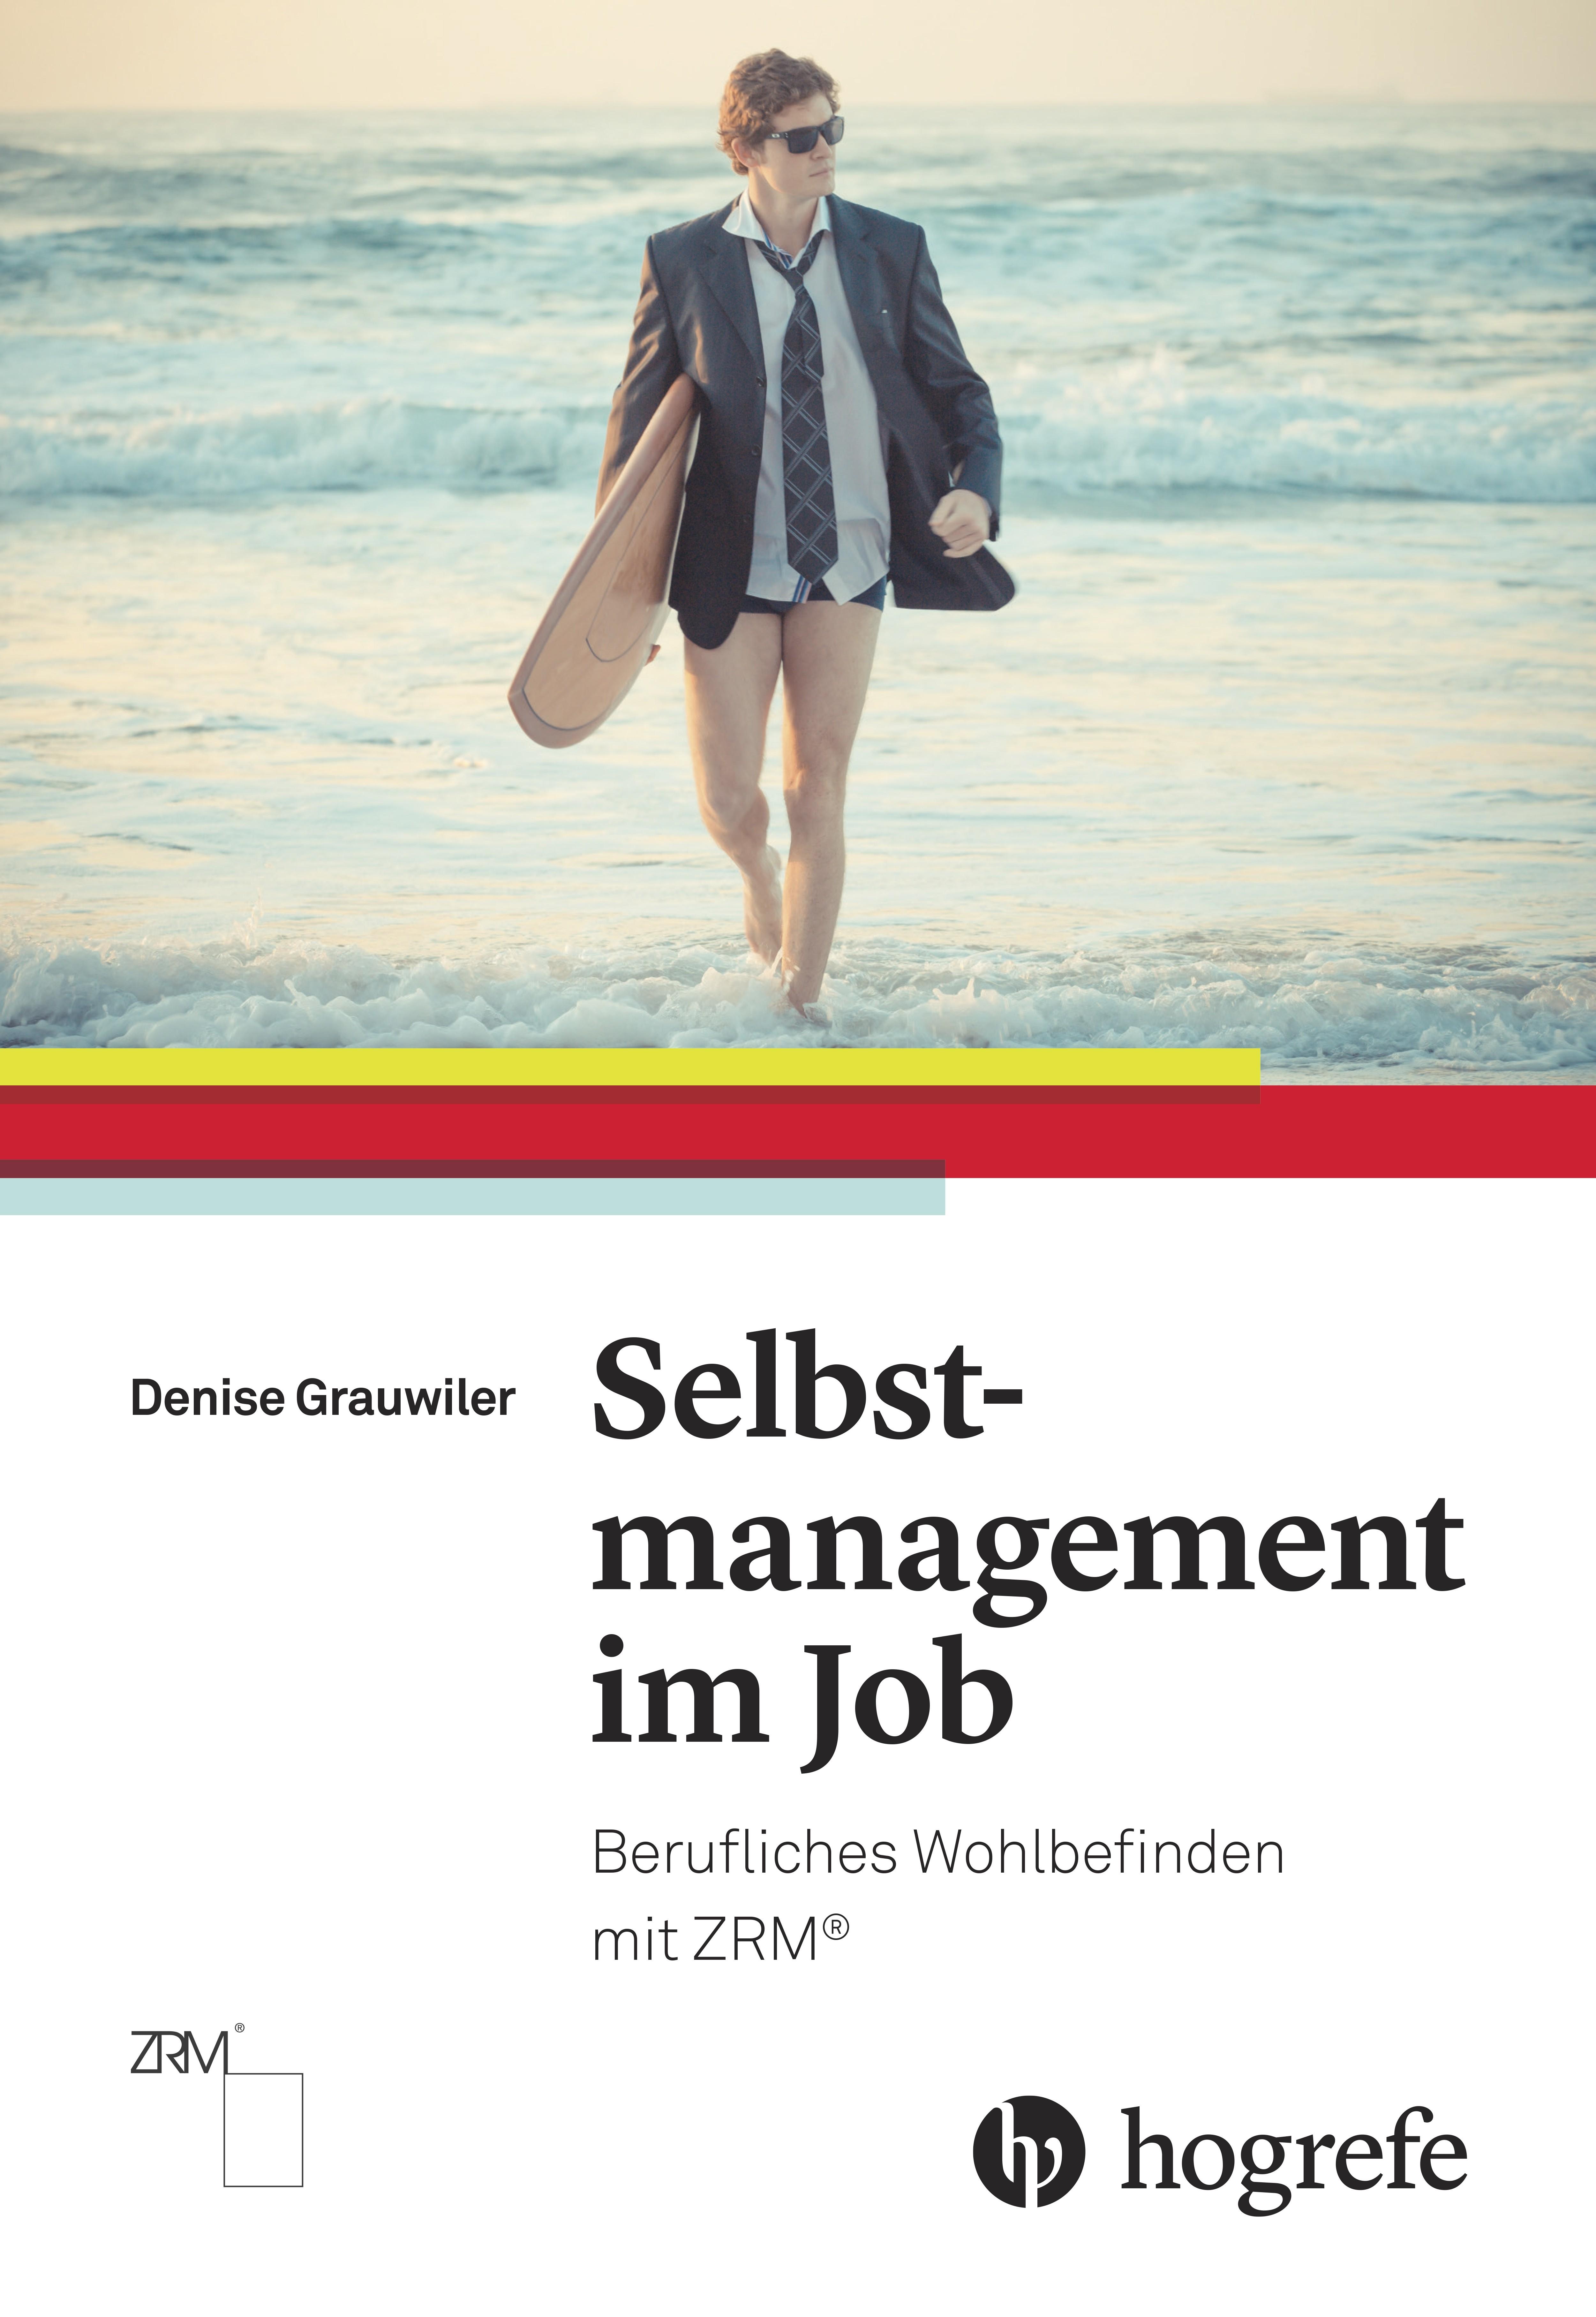 Selbstmanagement-im-Job-Denise-Grauwiler